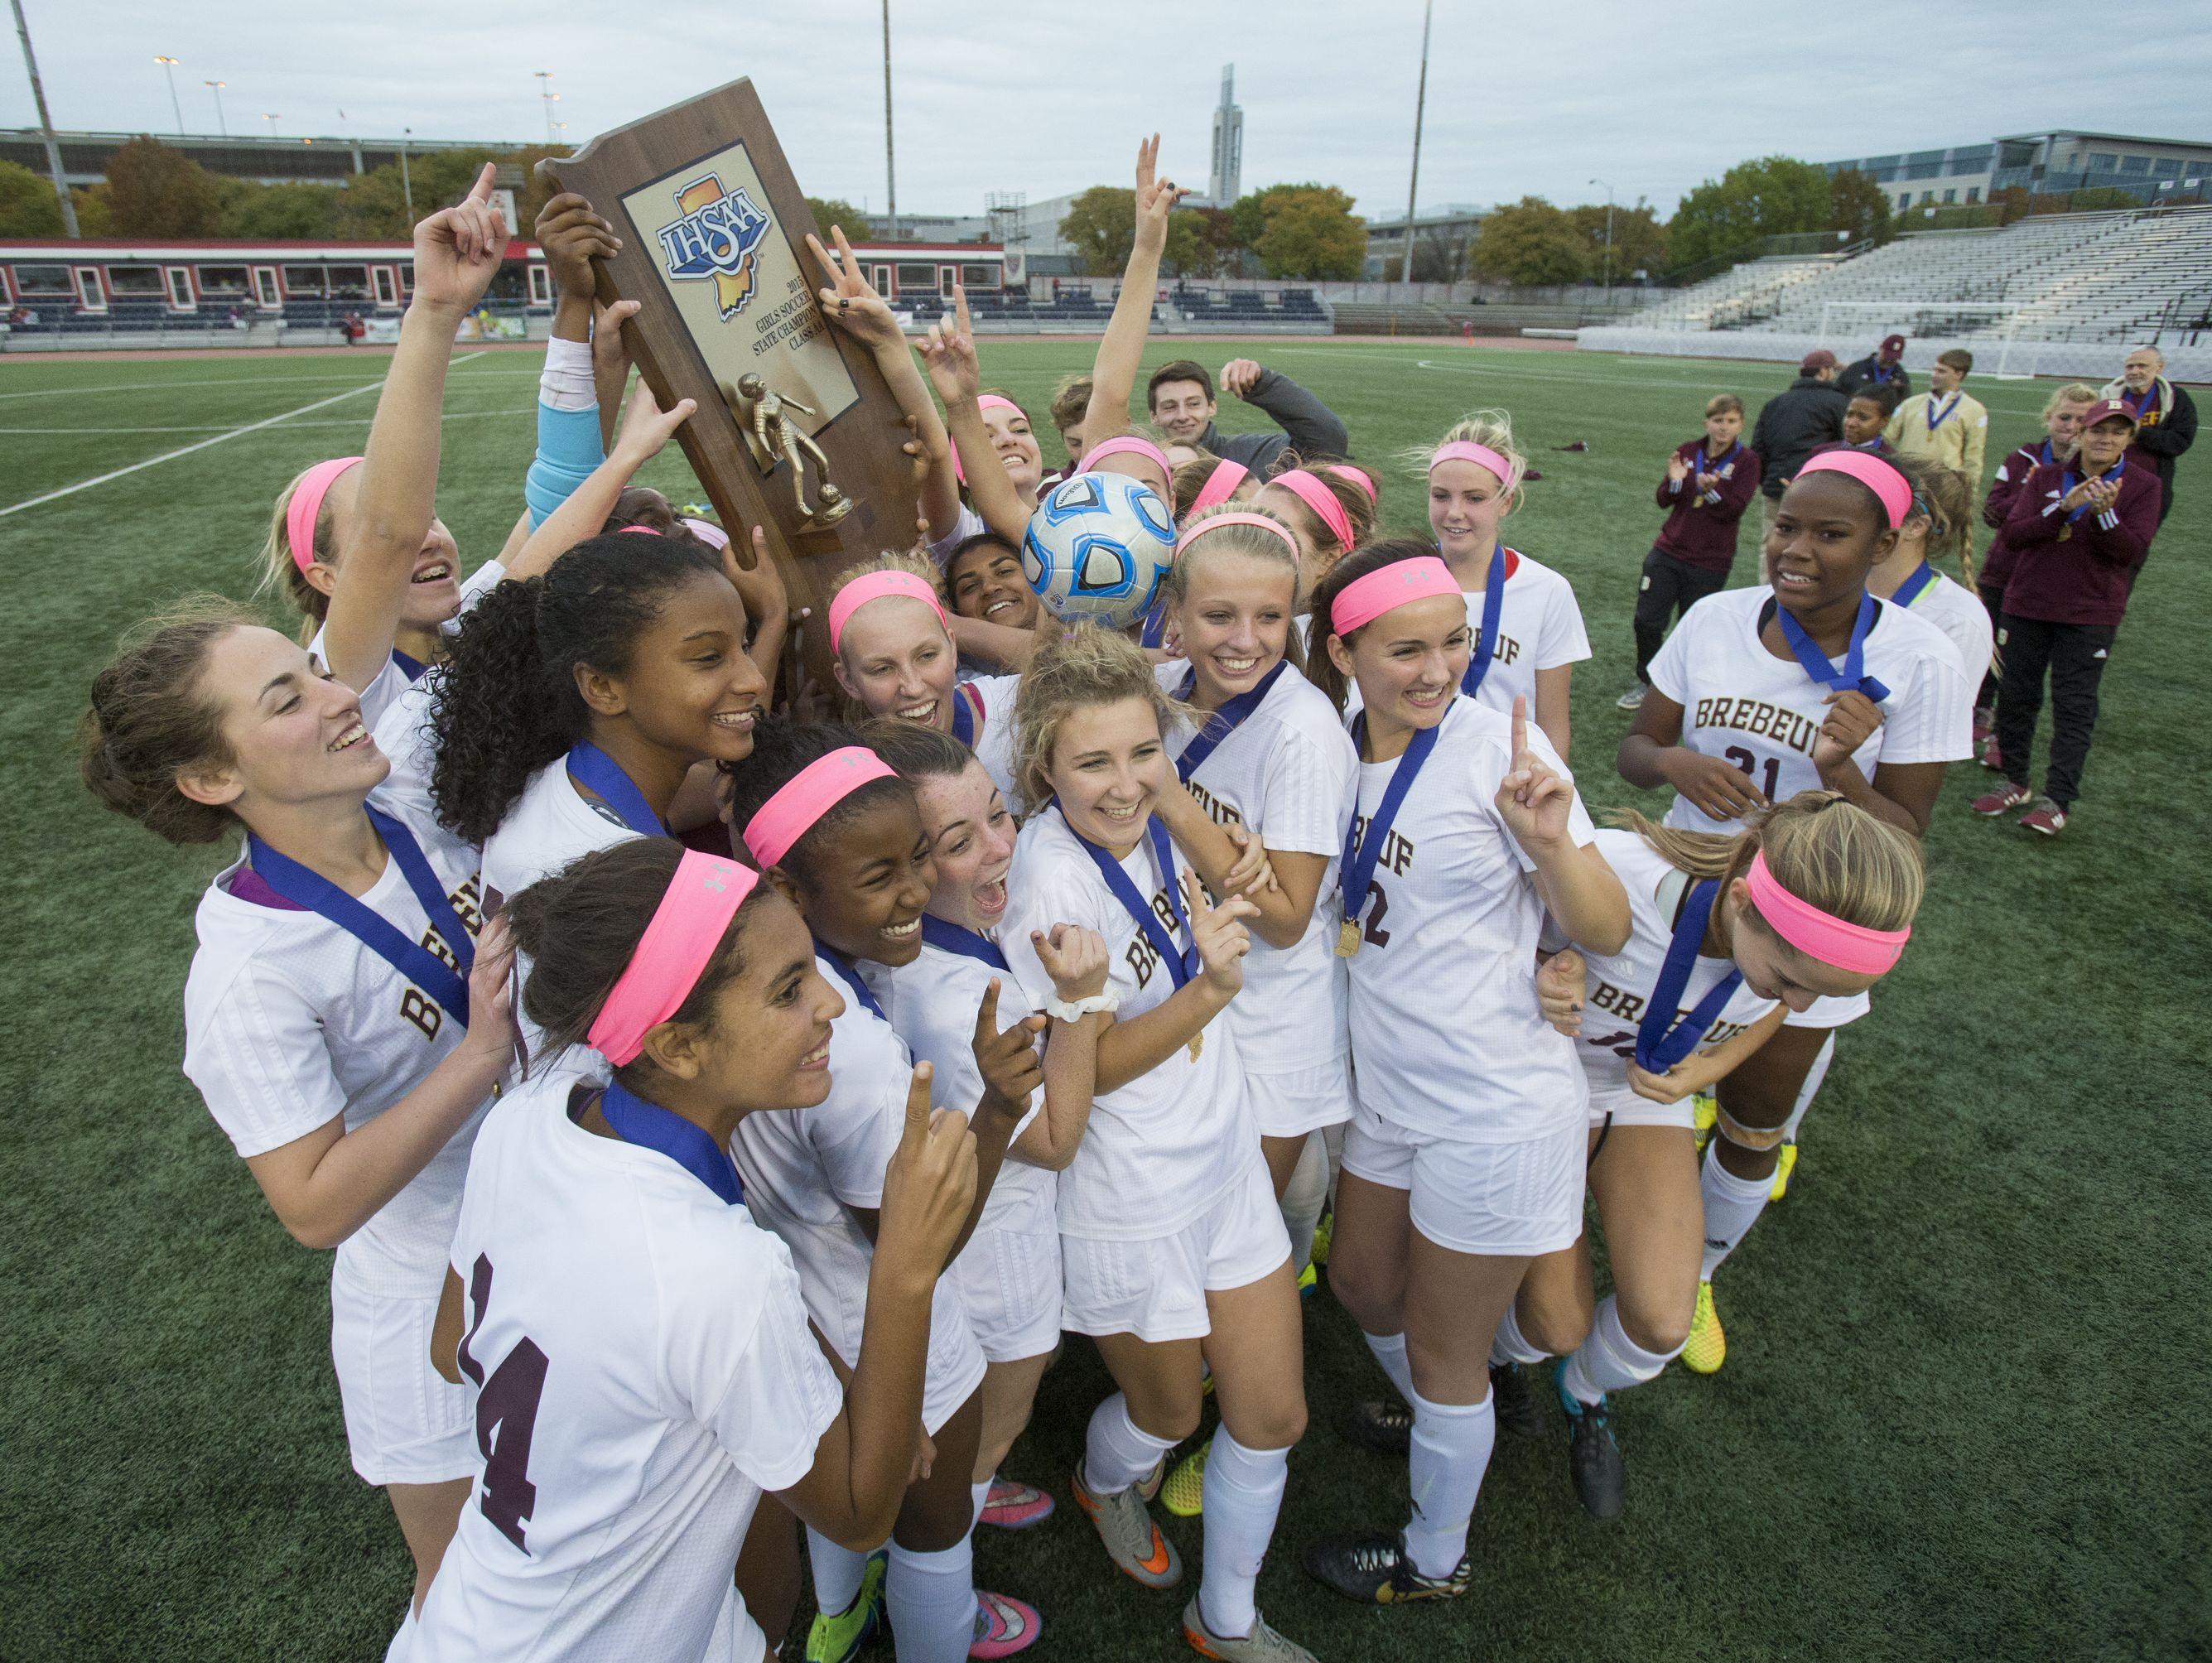 Brebeuf Jesuit celebrates their IHSAA Girls Class 2A State Soccer Finals win at, Carroll Stadium, Oct. 31, 2015. Brebeuf beat Penn, 2-1.